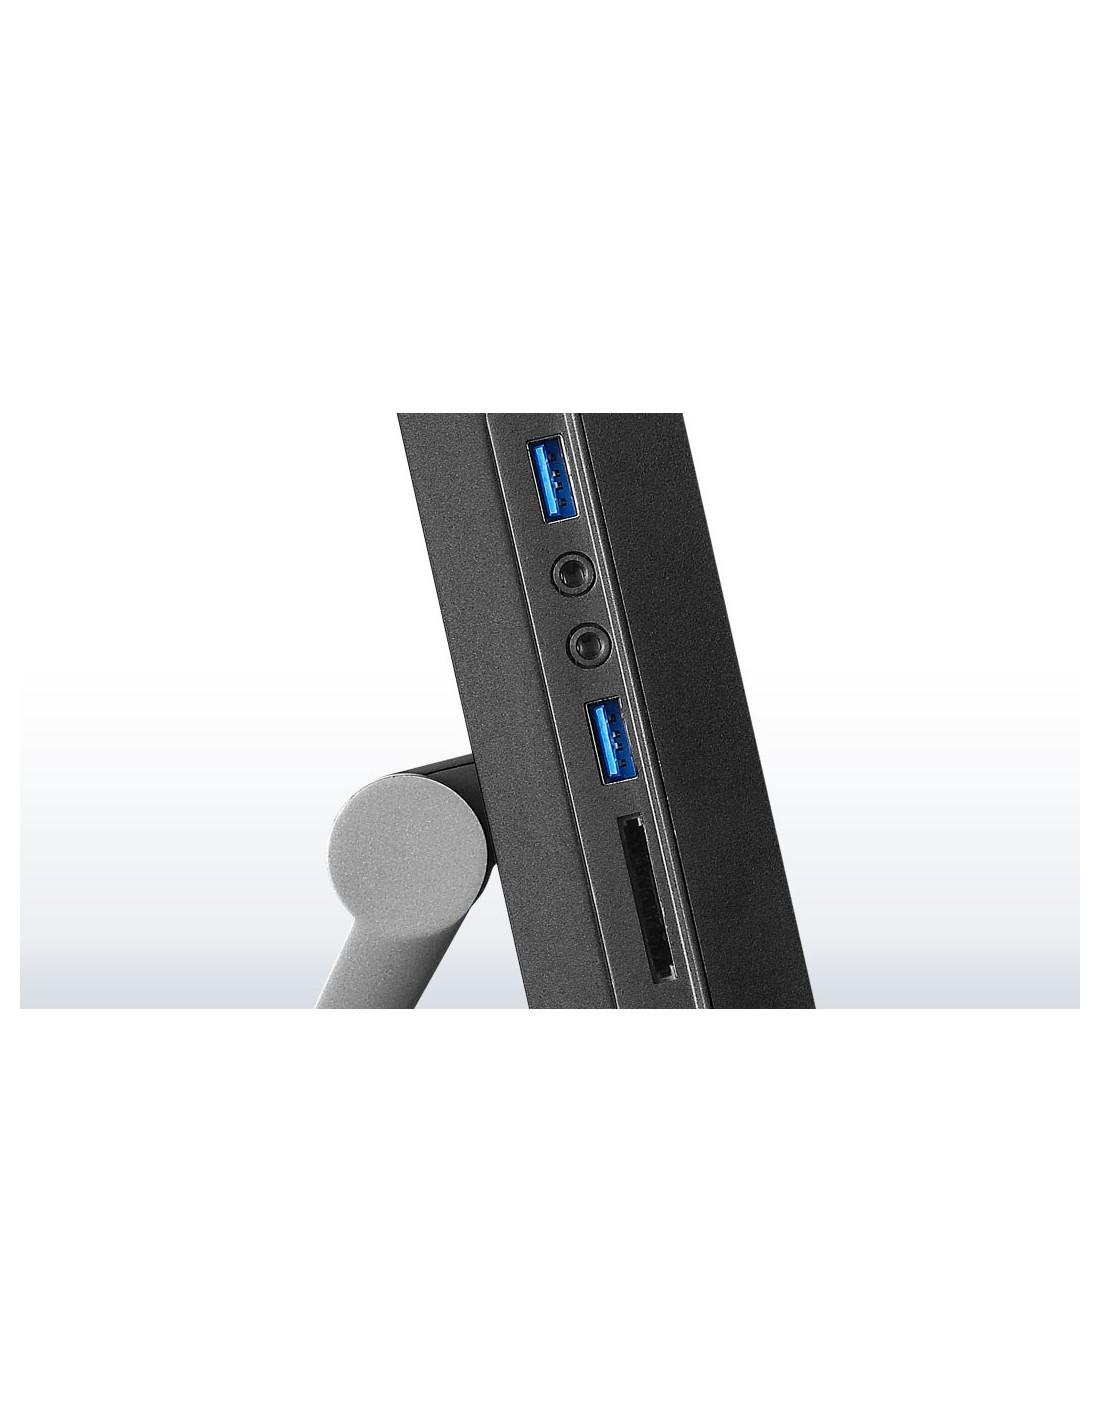 Prix Pc de bureau Lenovo All-in-One S200z   Quad Core   4 Go   Noir ... 682f180aa025